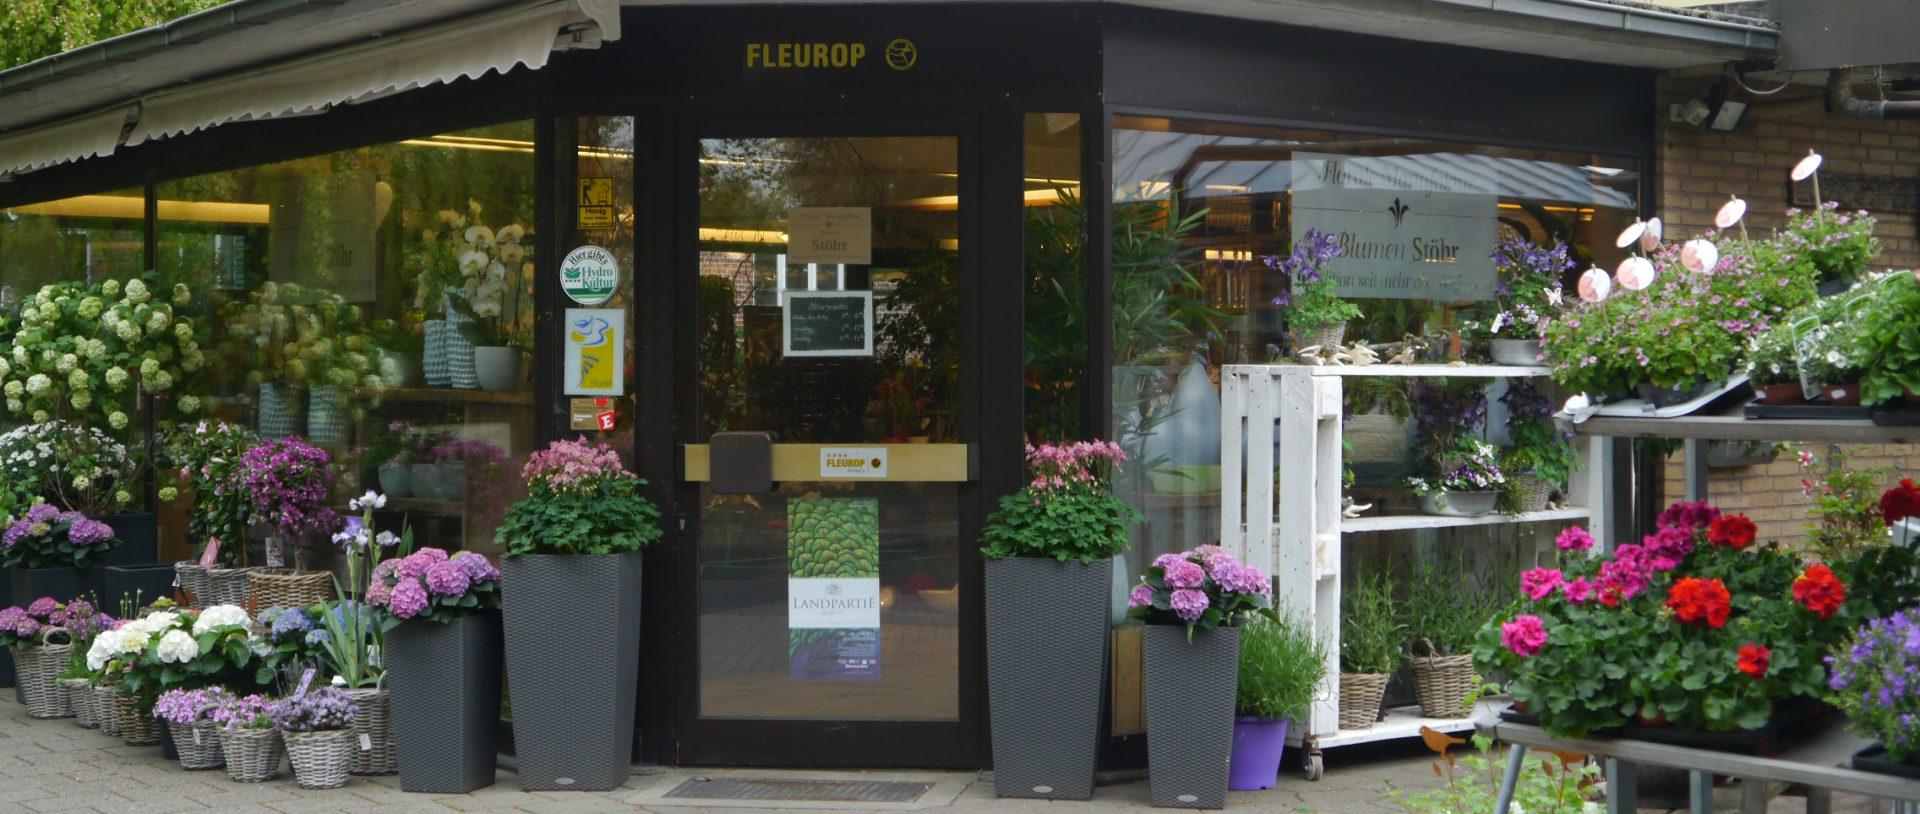 Florale Manufaktur Blumen Stöhr